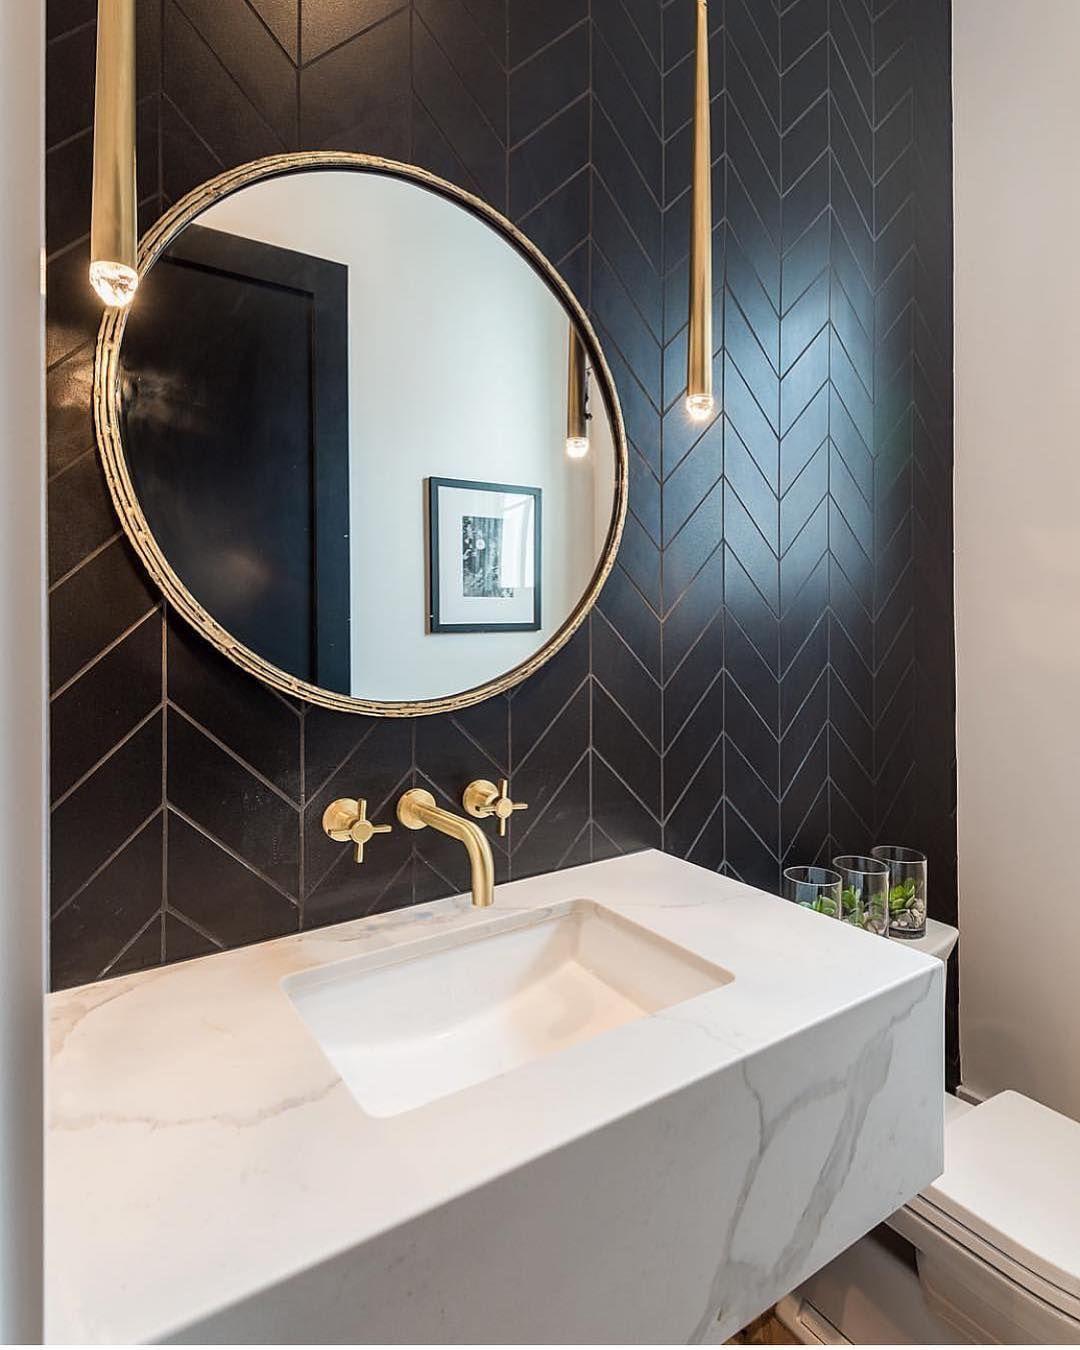 Bathrooms Of Instagram Elegant